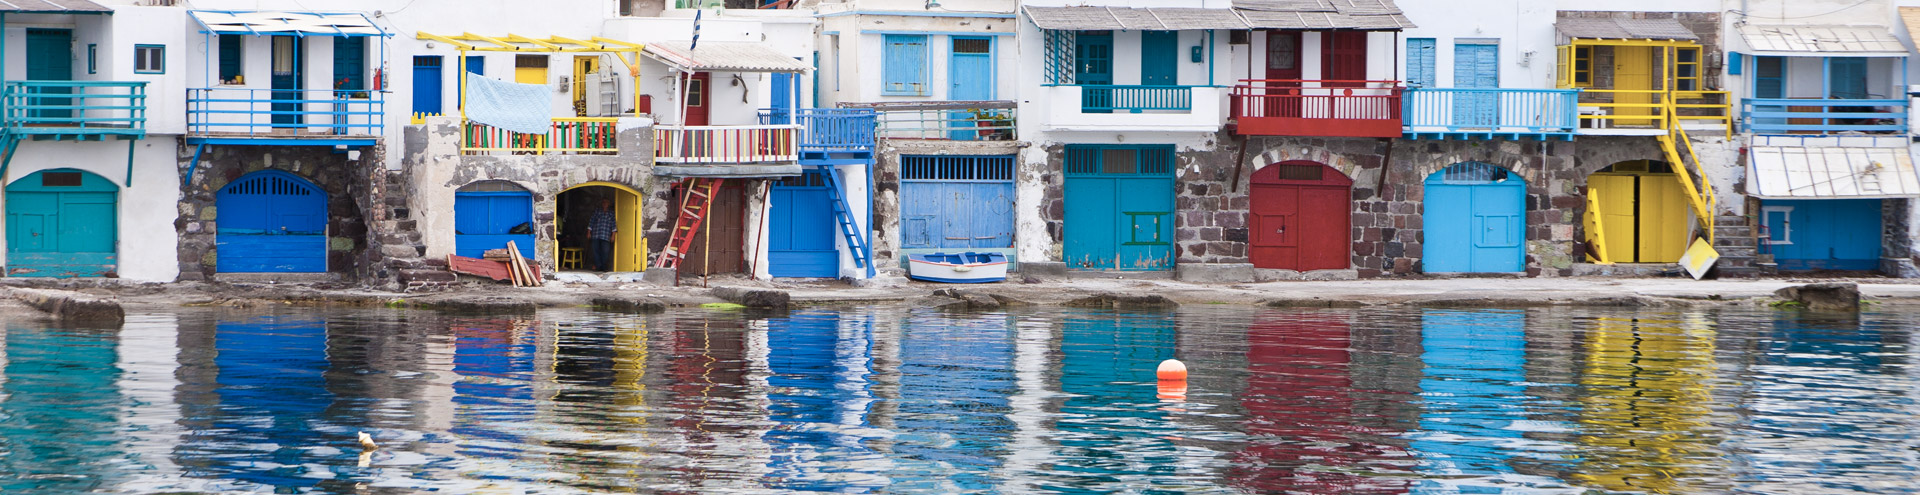 Klima Bootshäuser